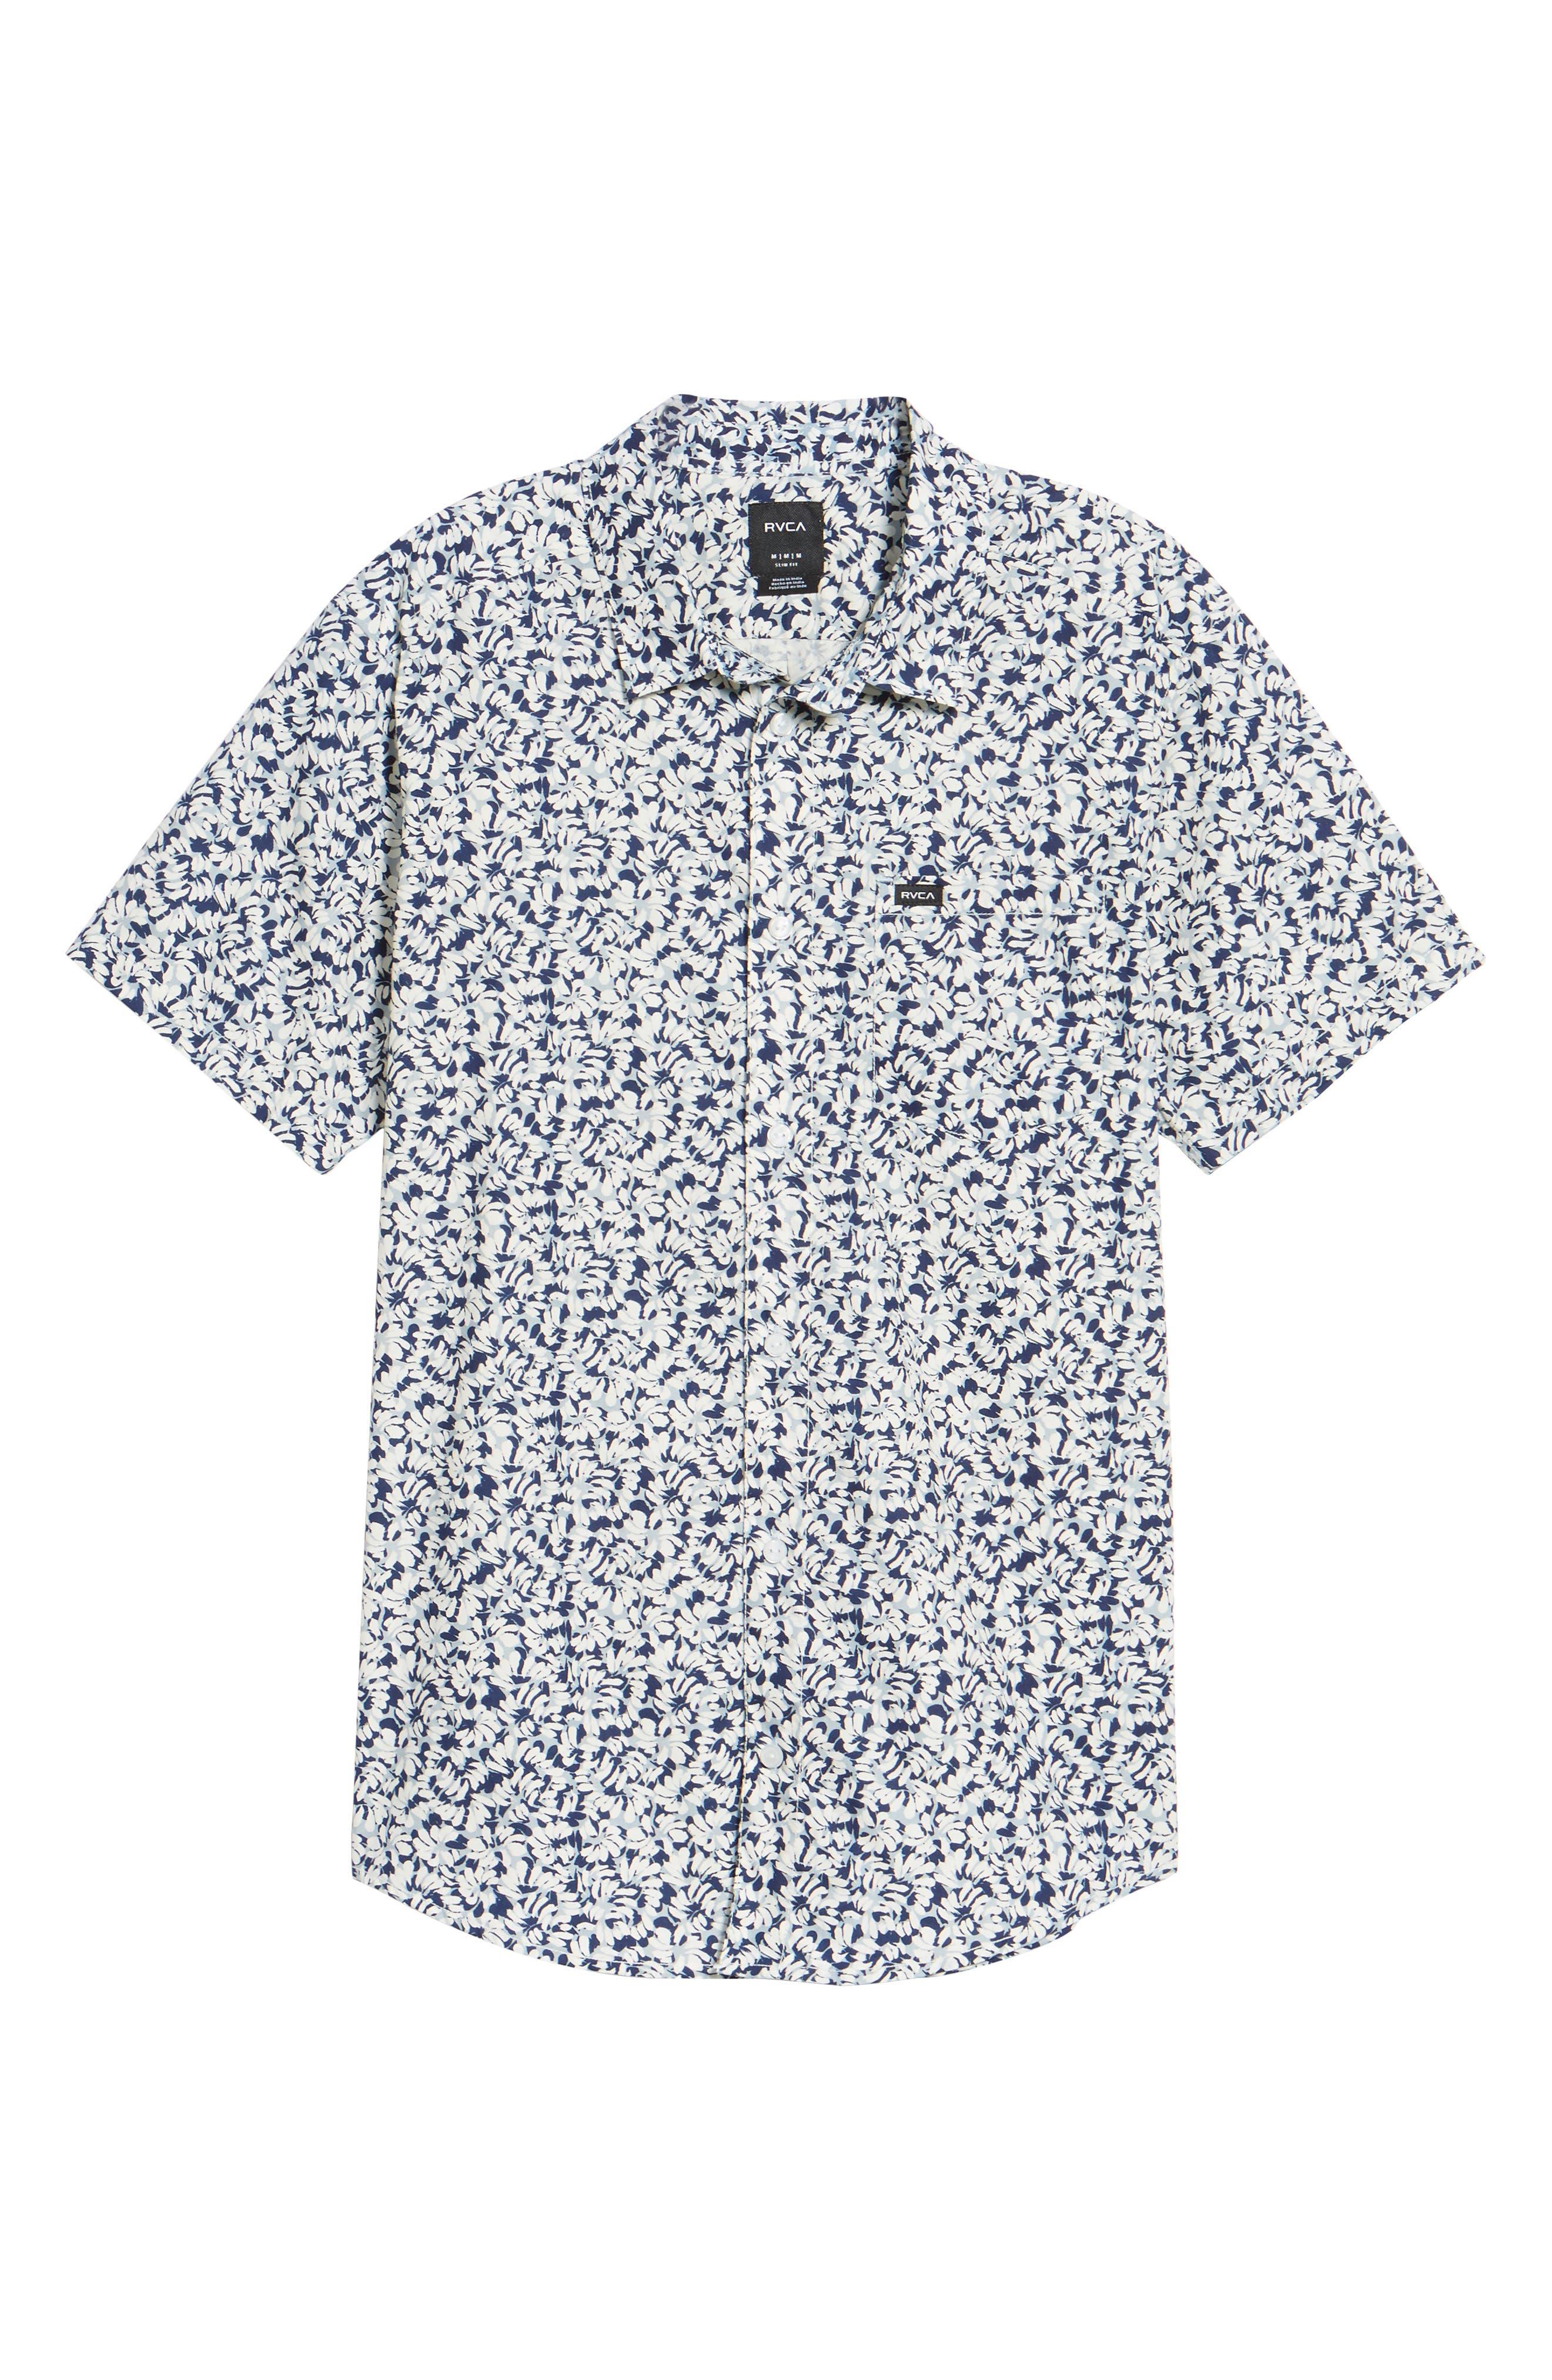 Brong Short Sleeve Shirt,                             Alternate thumbnail 6, color,                             020